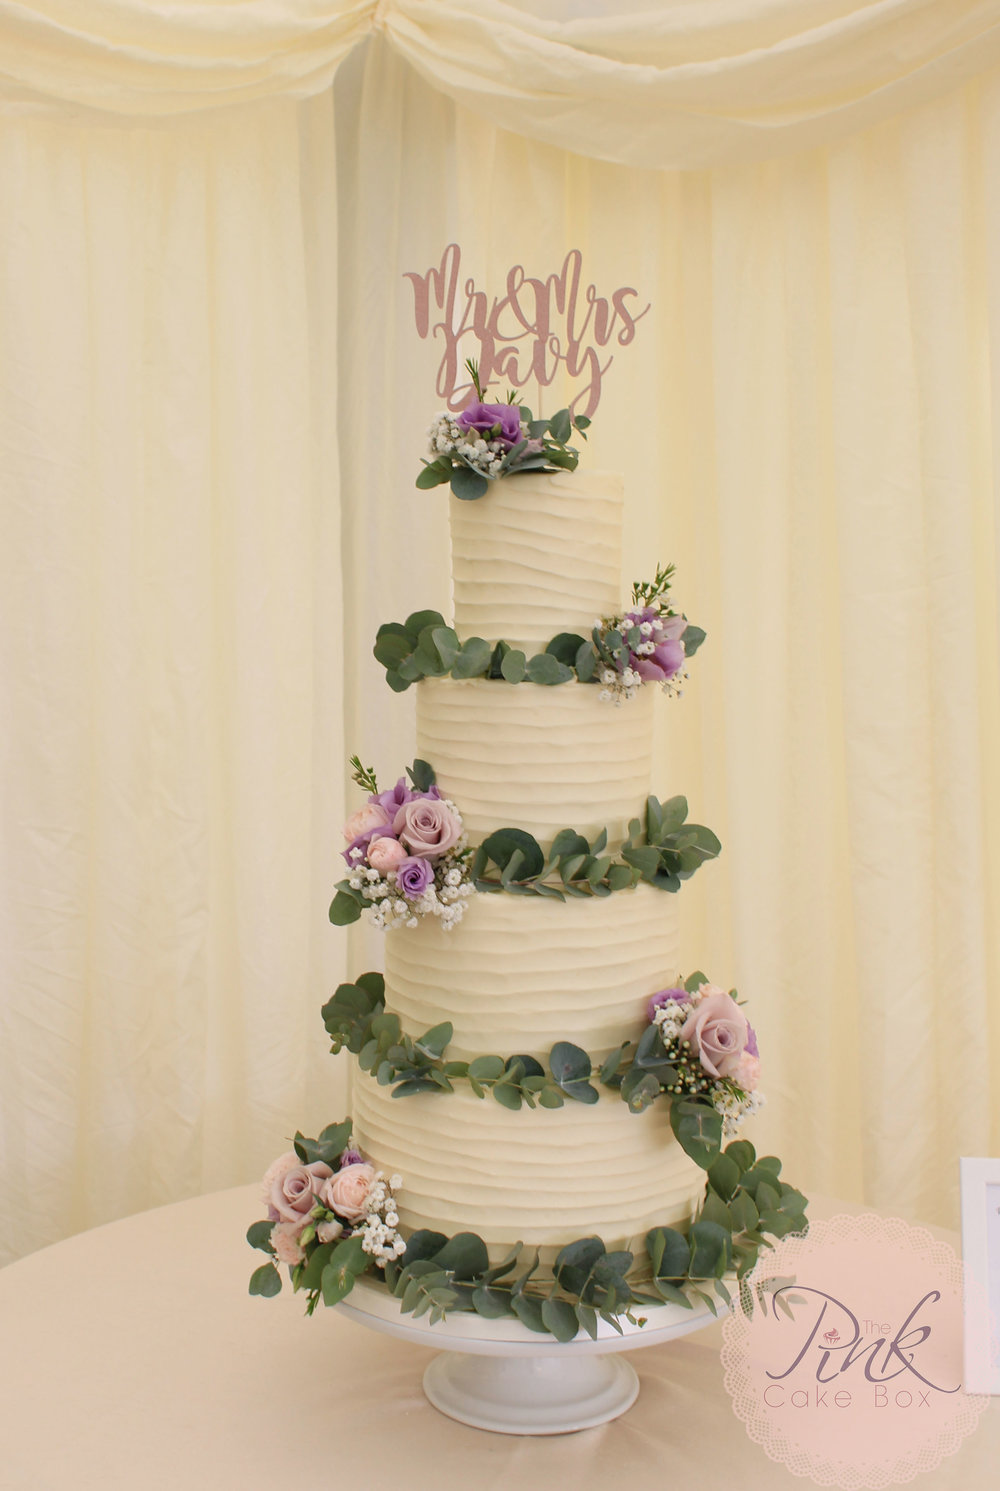 Buttercream Wedding Cakes The Pink Cake Box Wedding Cake Design